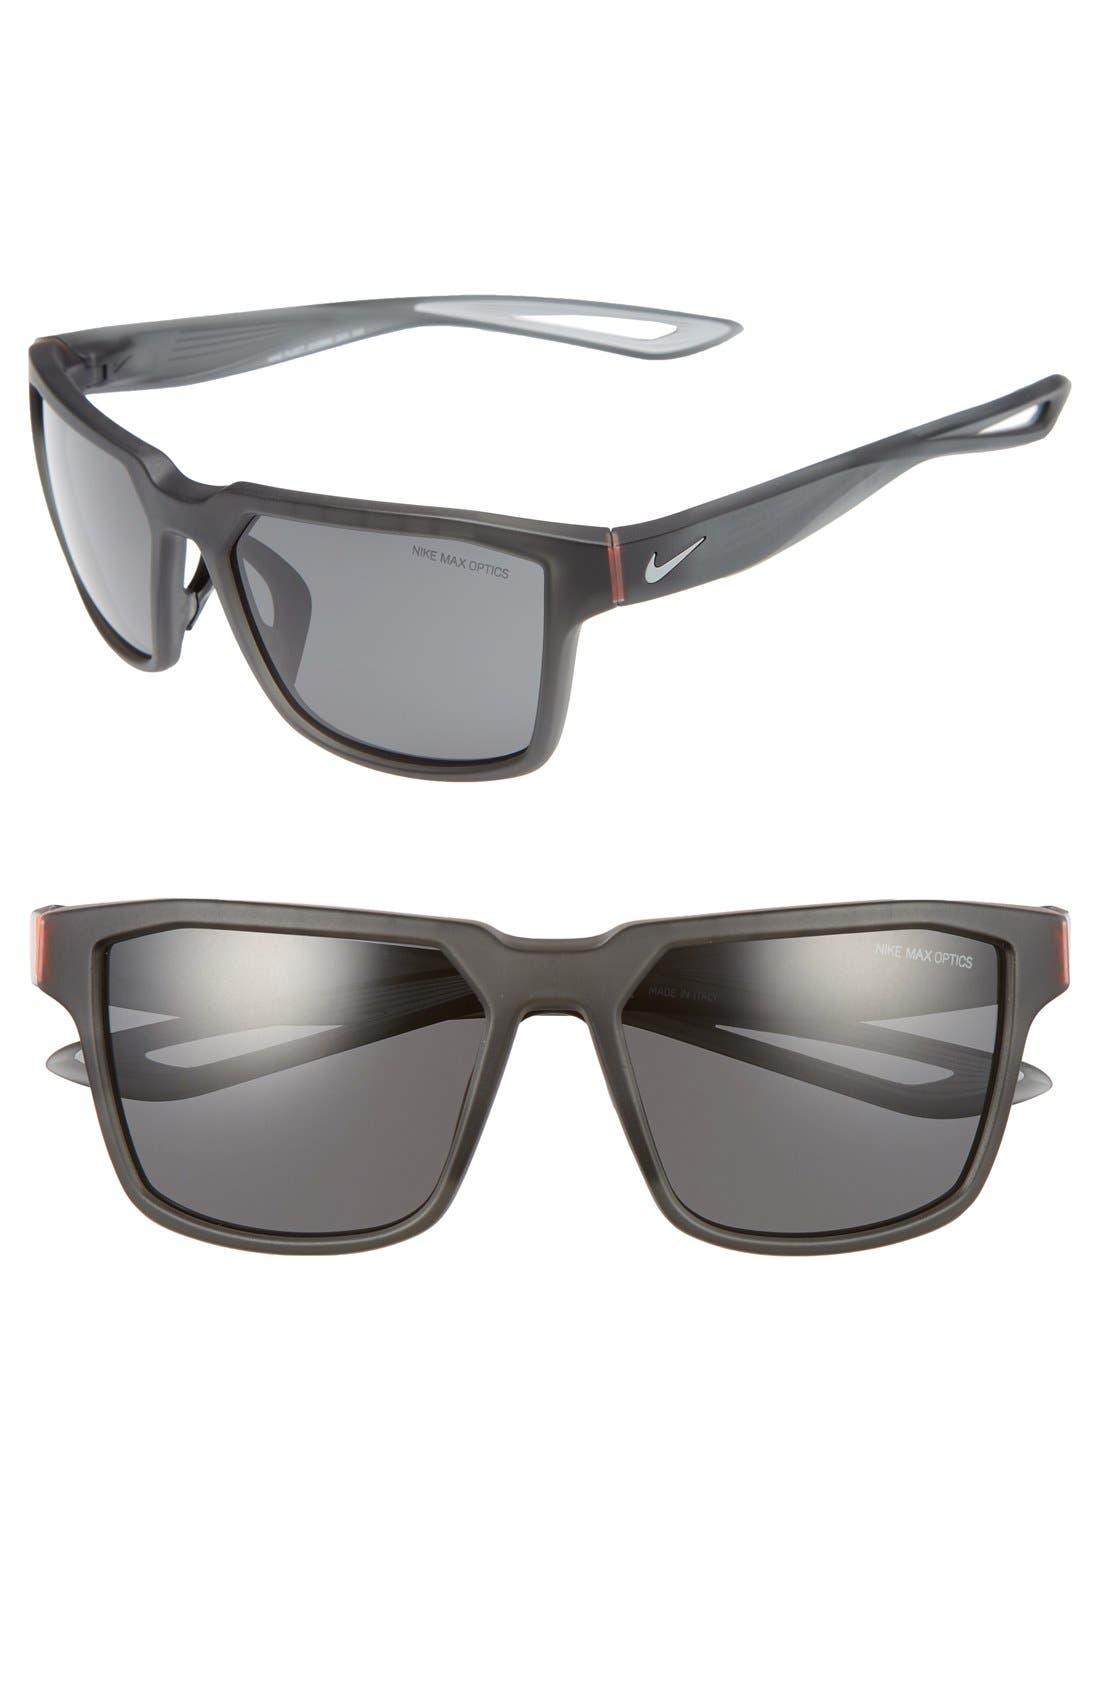 NIKE Fleet 55mm Sport Sunglasses, Main, color, MATTE ANTHRACITE